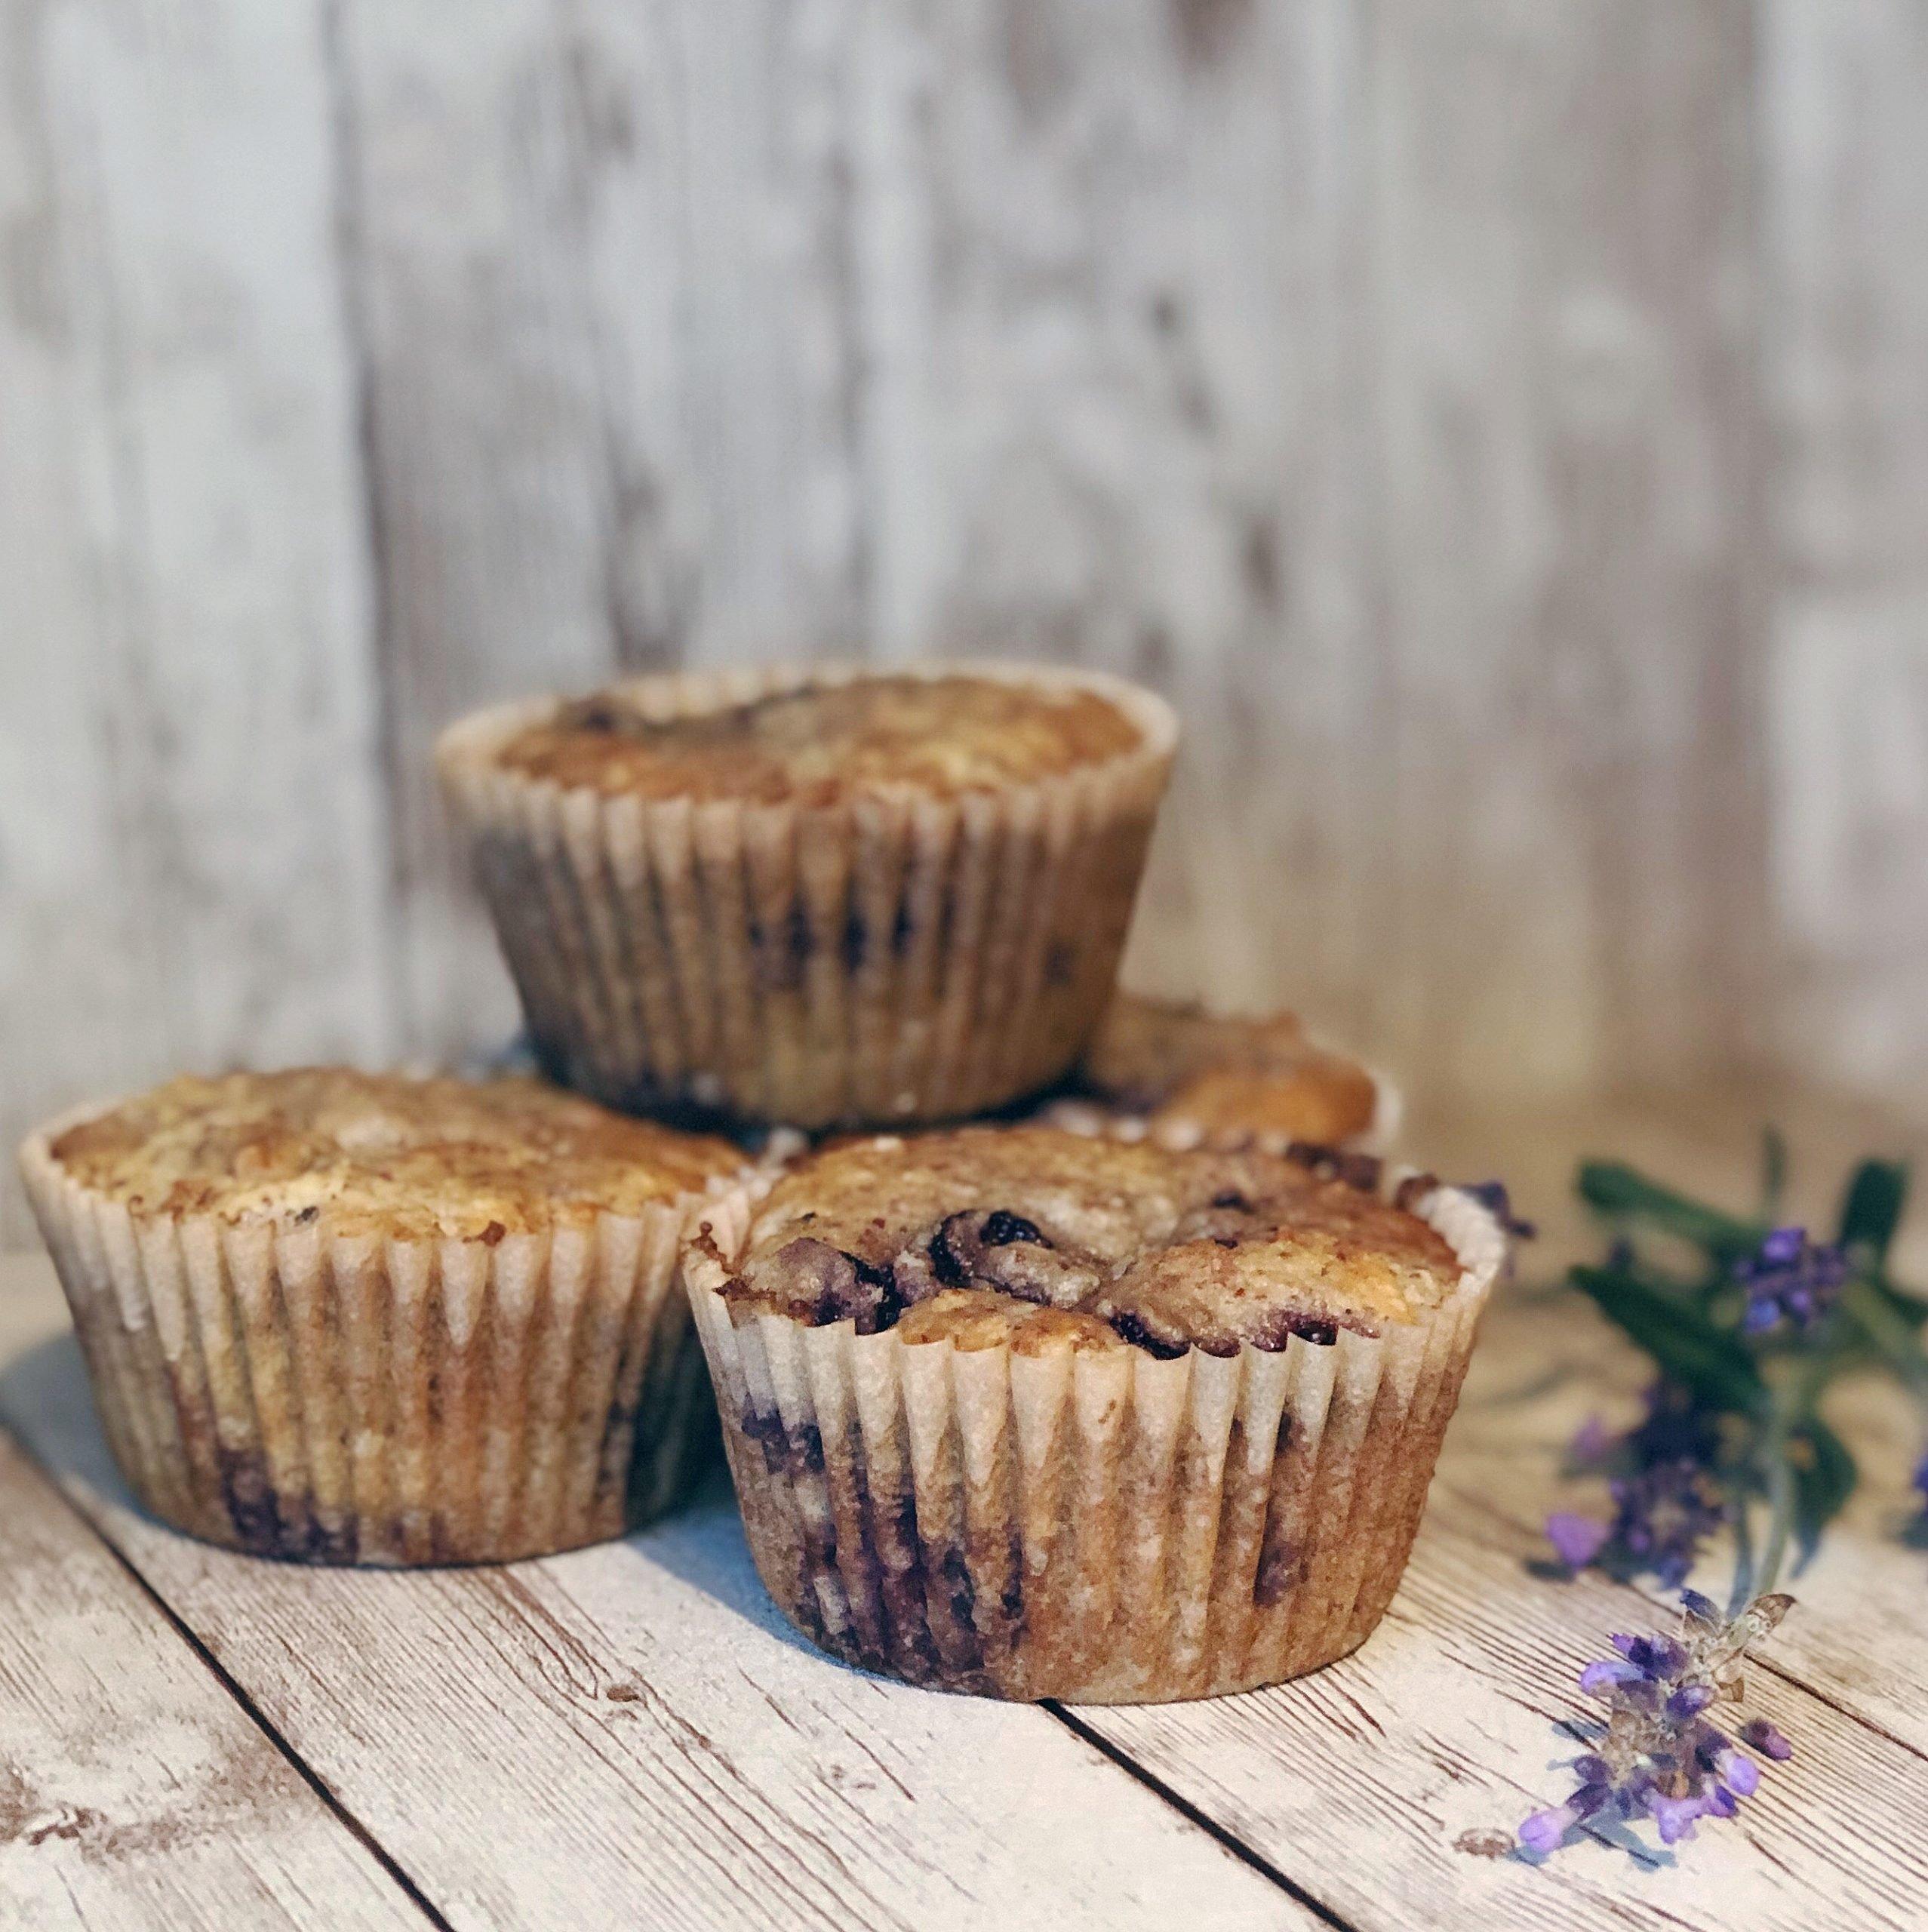 Cherry Lavender Muffins